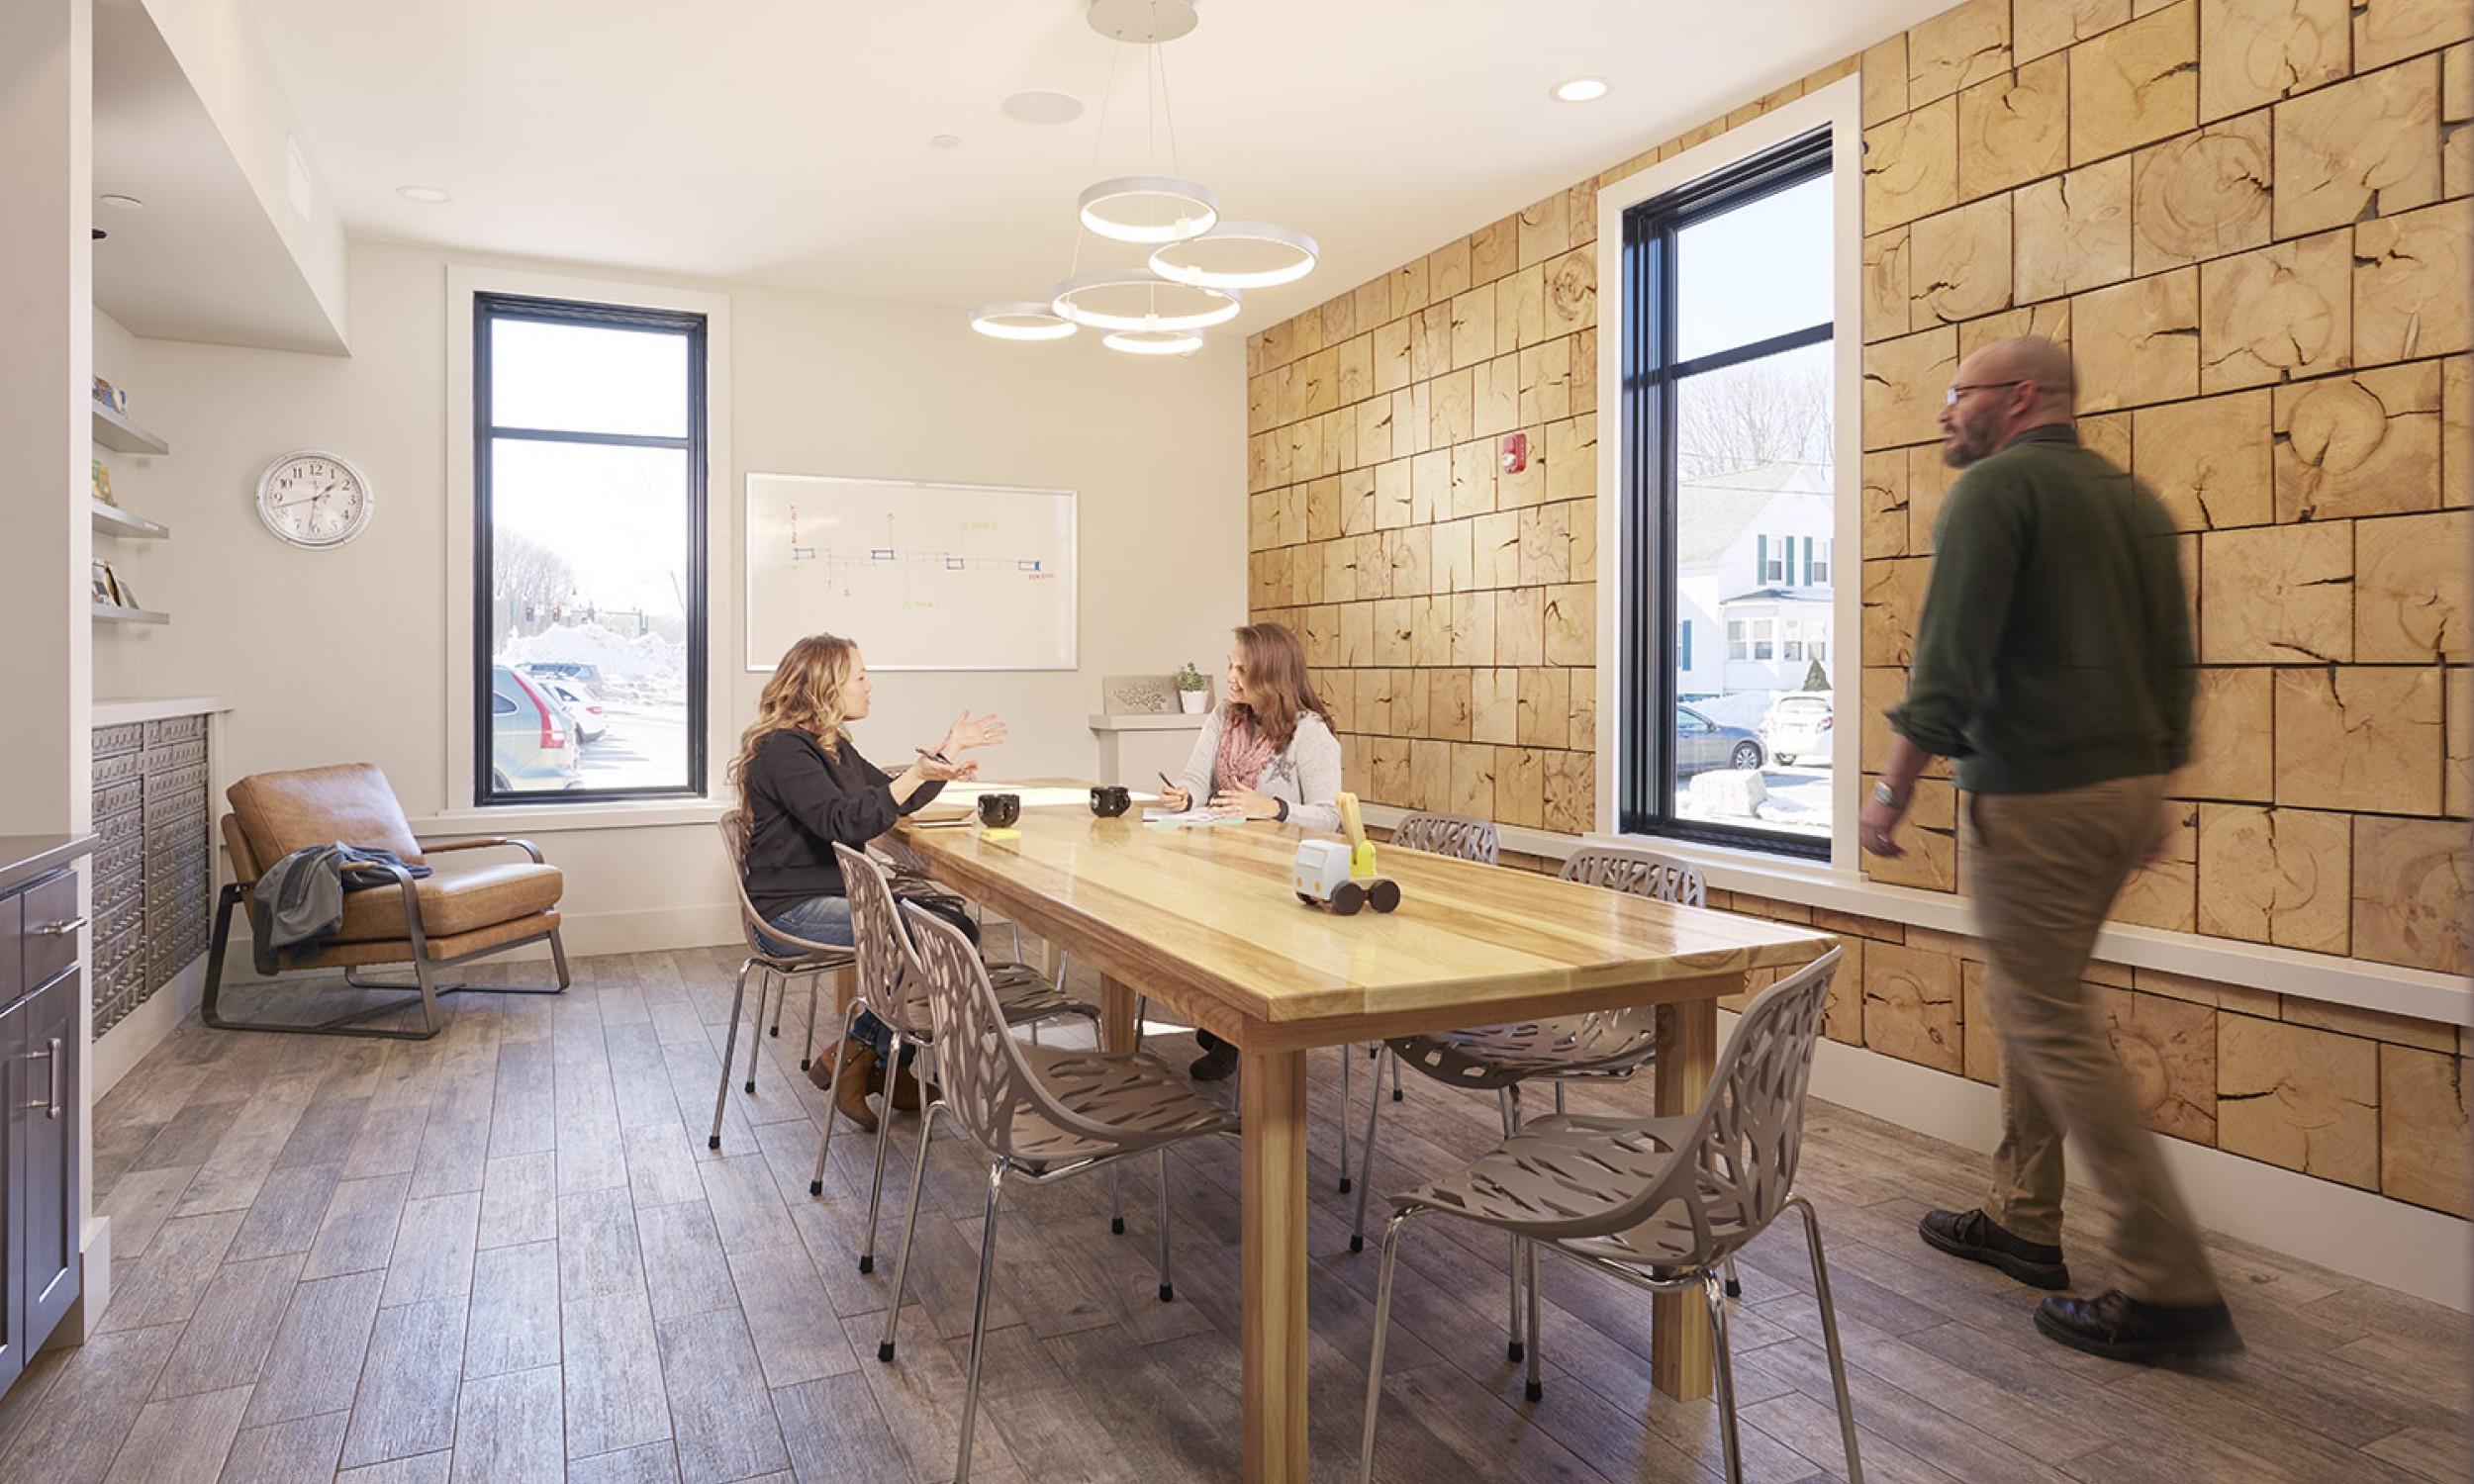 Meeting Room, maine architect, interior design, wood wall finish